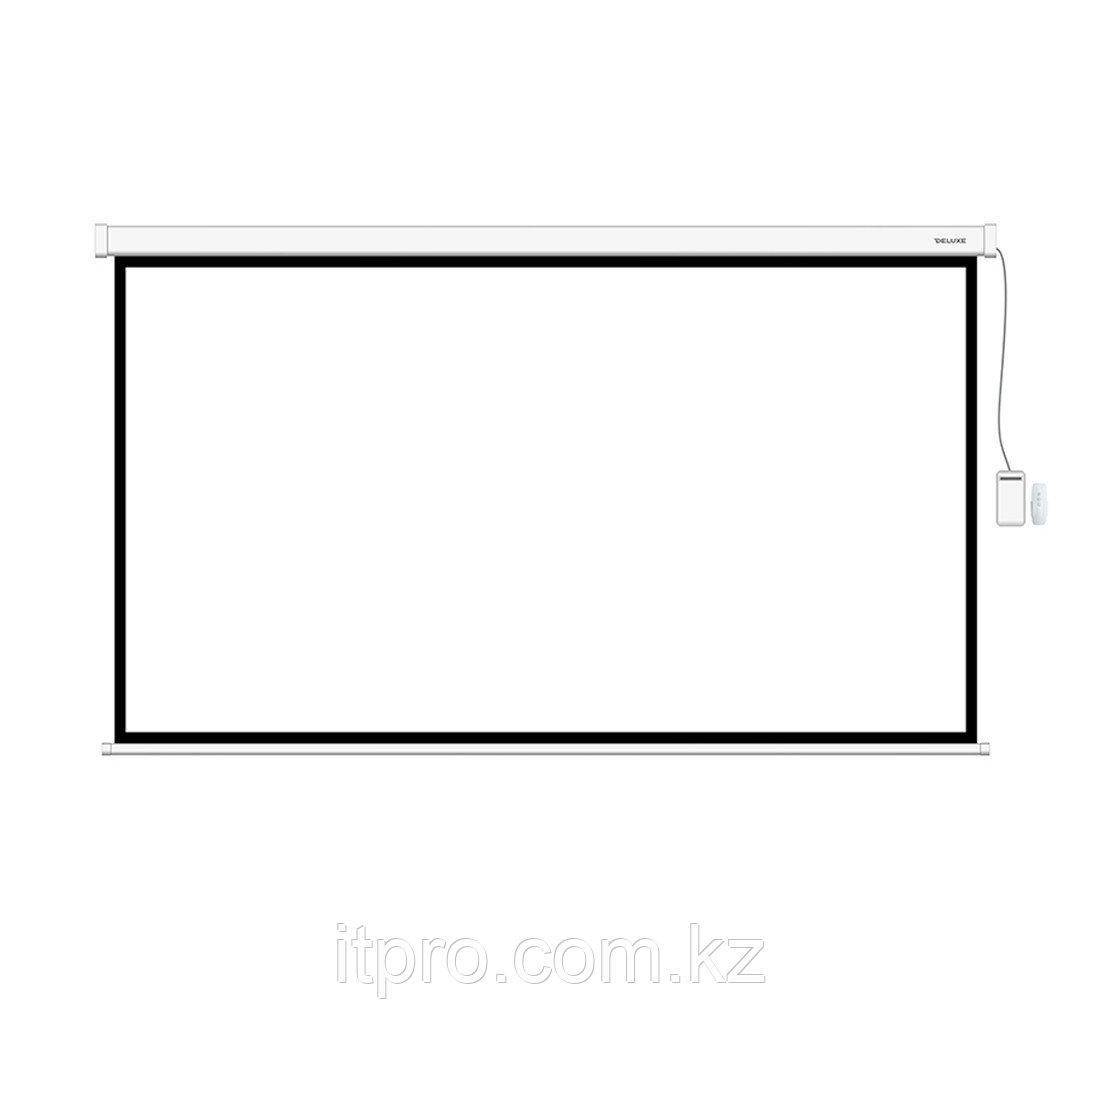 Экран моторизированный Deluxe DLS-ERC240x135W